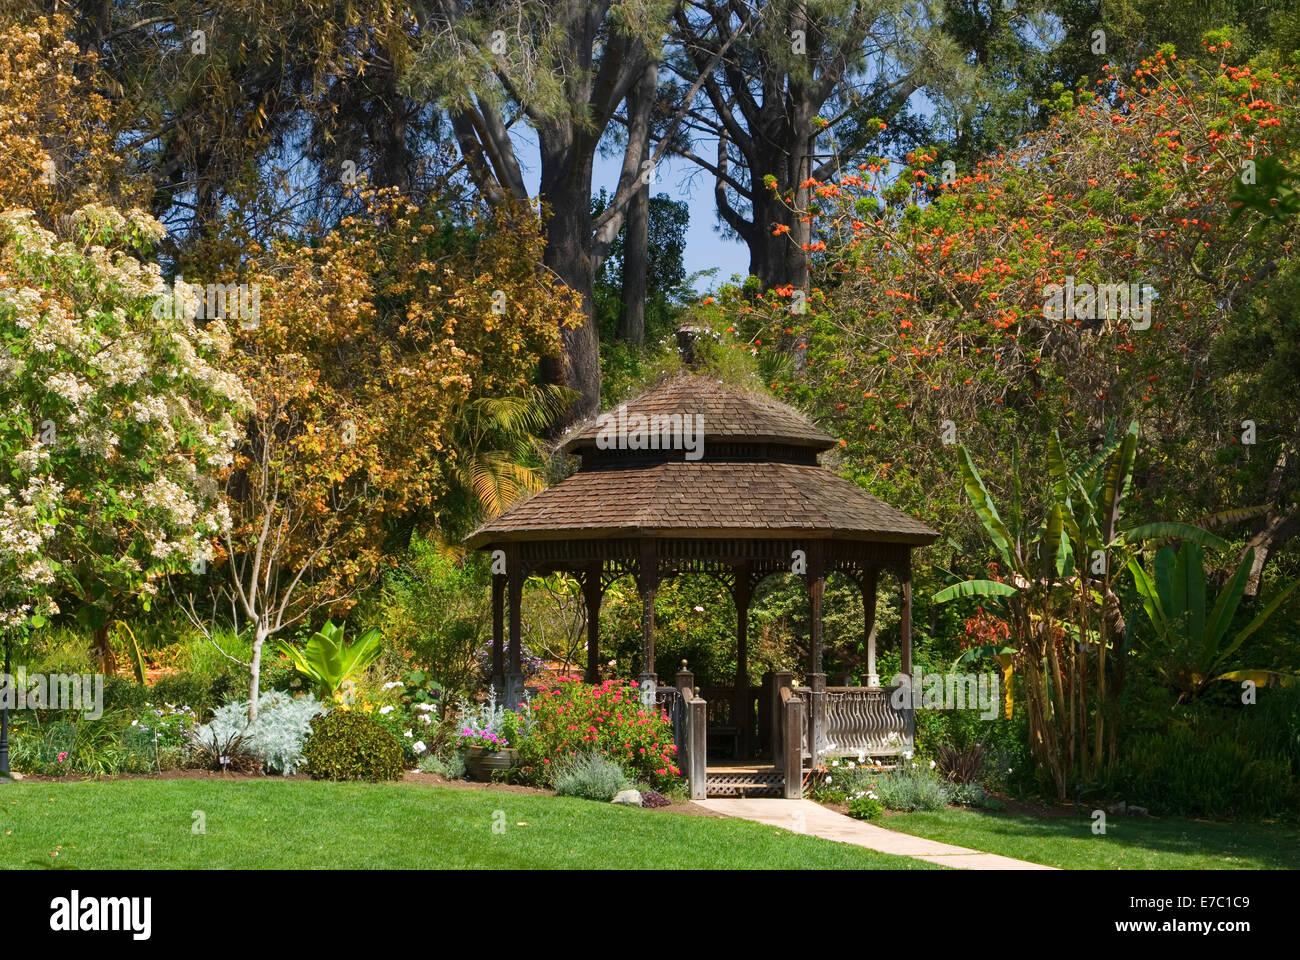 San Diego Gardens Stock Photos & San Diego Gardens Stock Images - Alamy